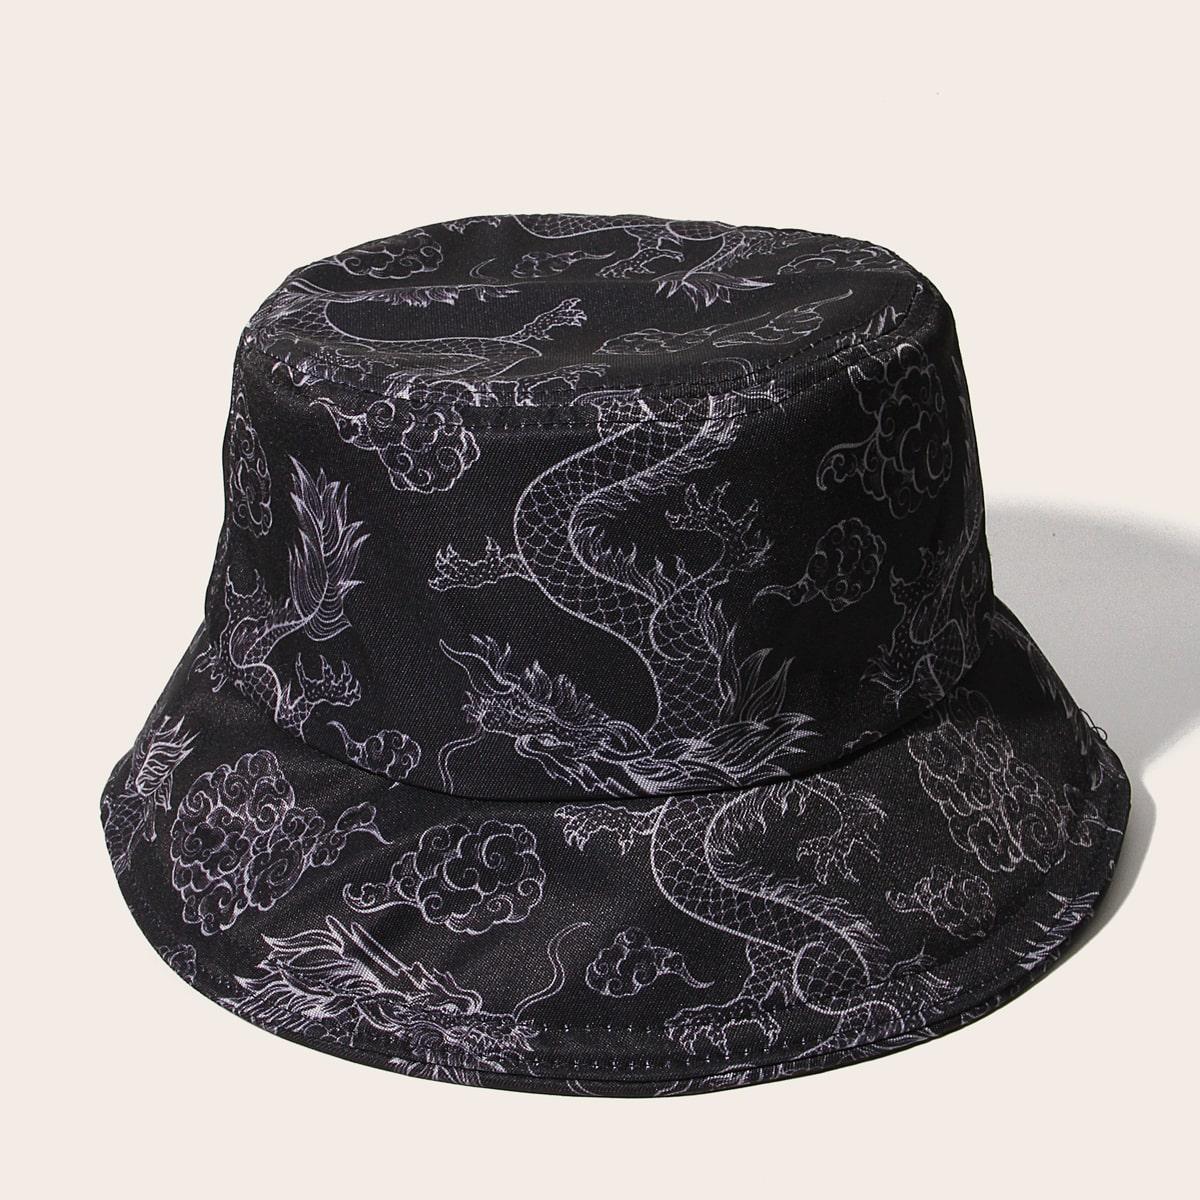 Шляпа с узором китайского дракона